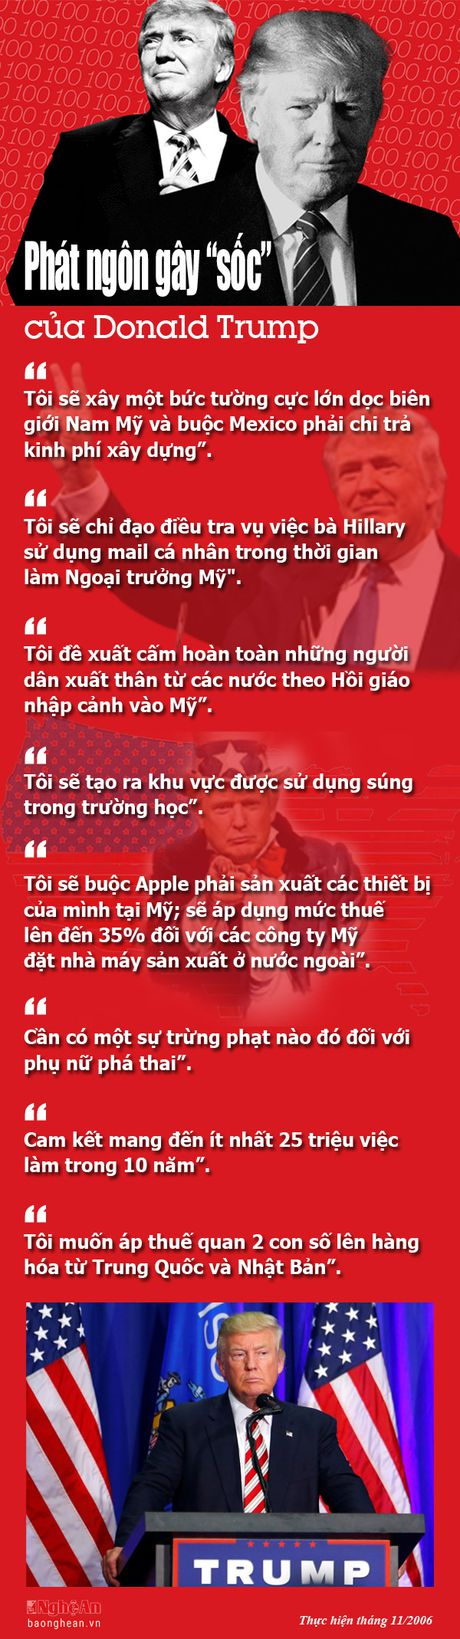 Infographic: Nhung phat ngon gay 'soc' cua Donald Trump - Anh 1